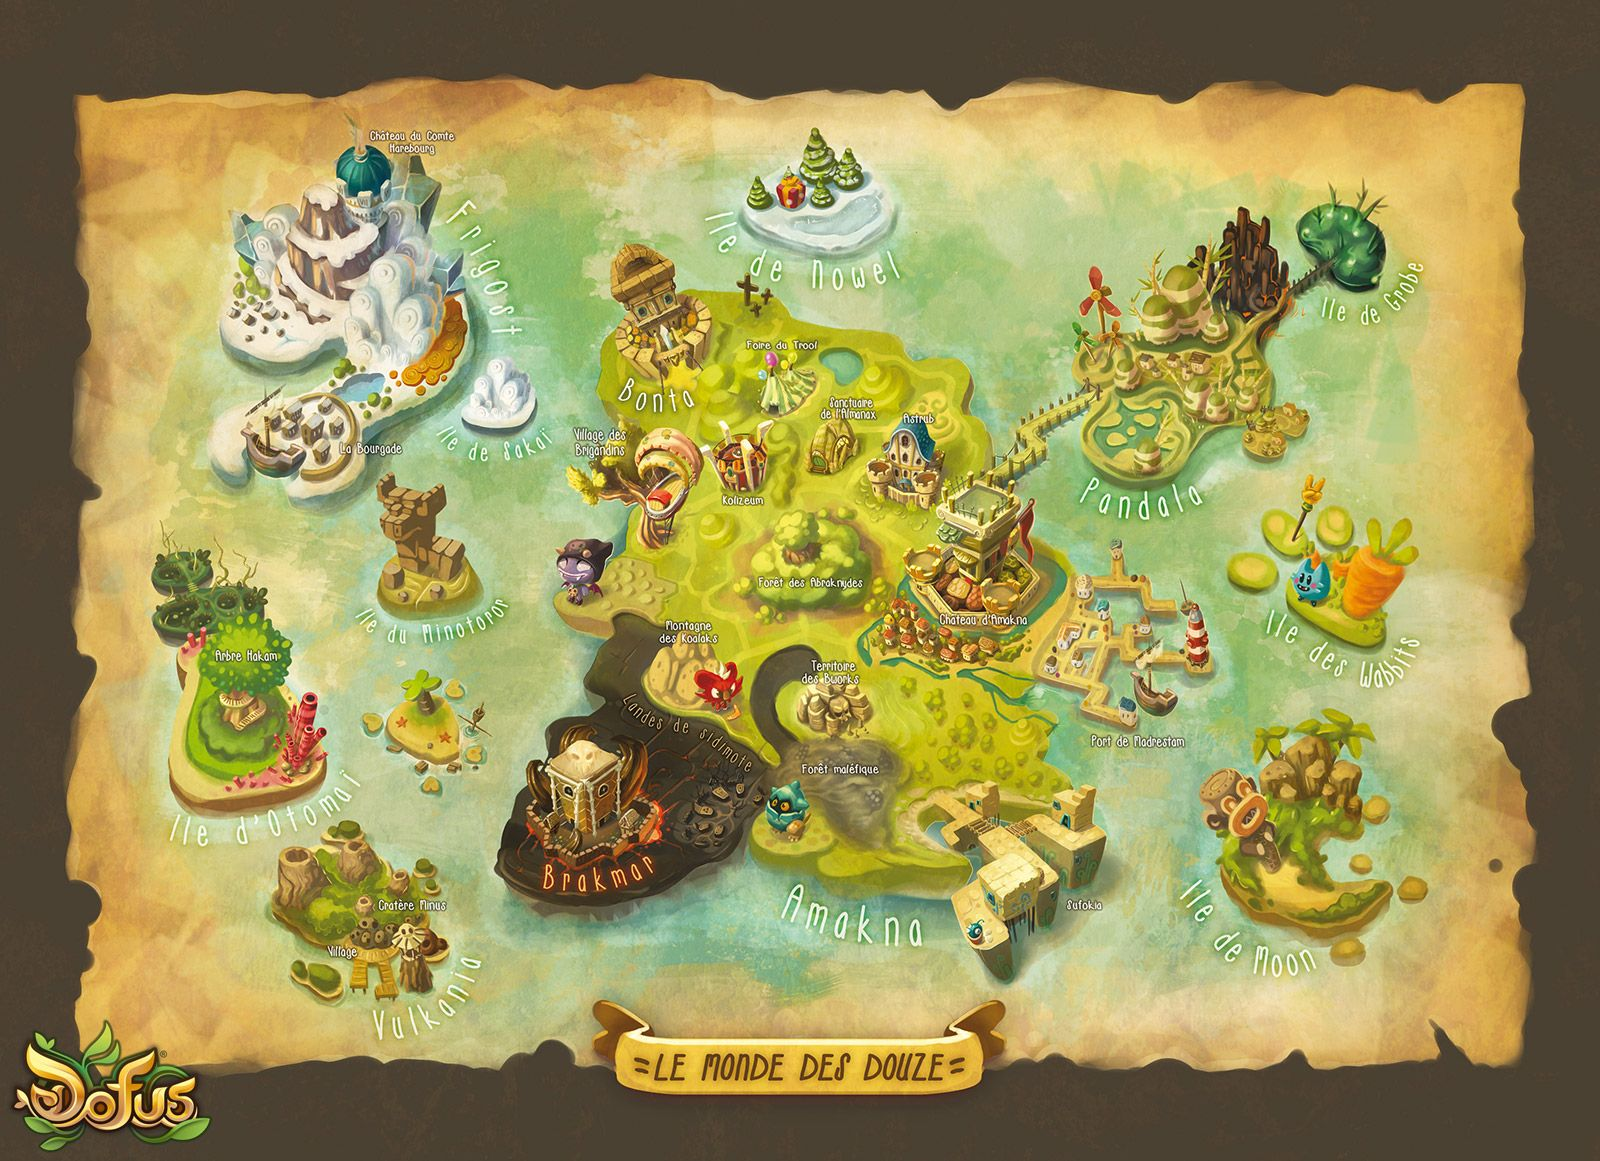 Http Www Dofus Com Fr Mmorpg Medias Illustrations 418928 Carte Monde 12 Avec Images Dofus Idees De Tatouages Ankama